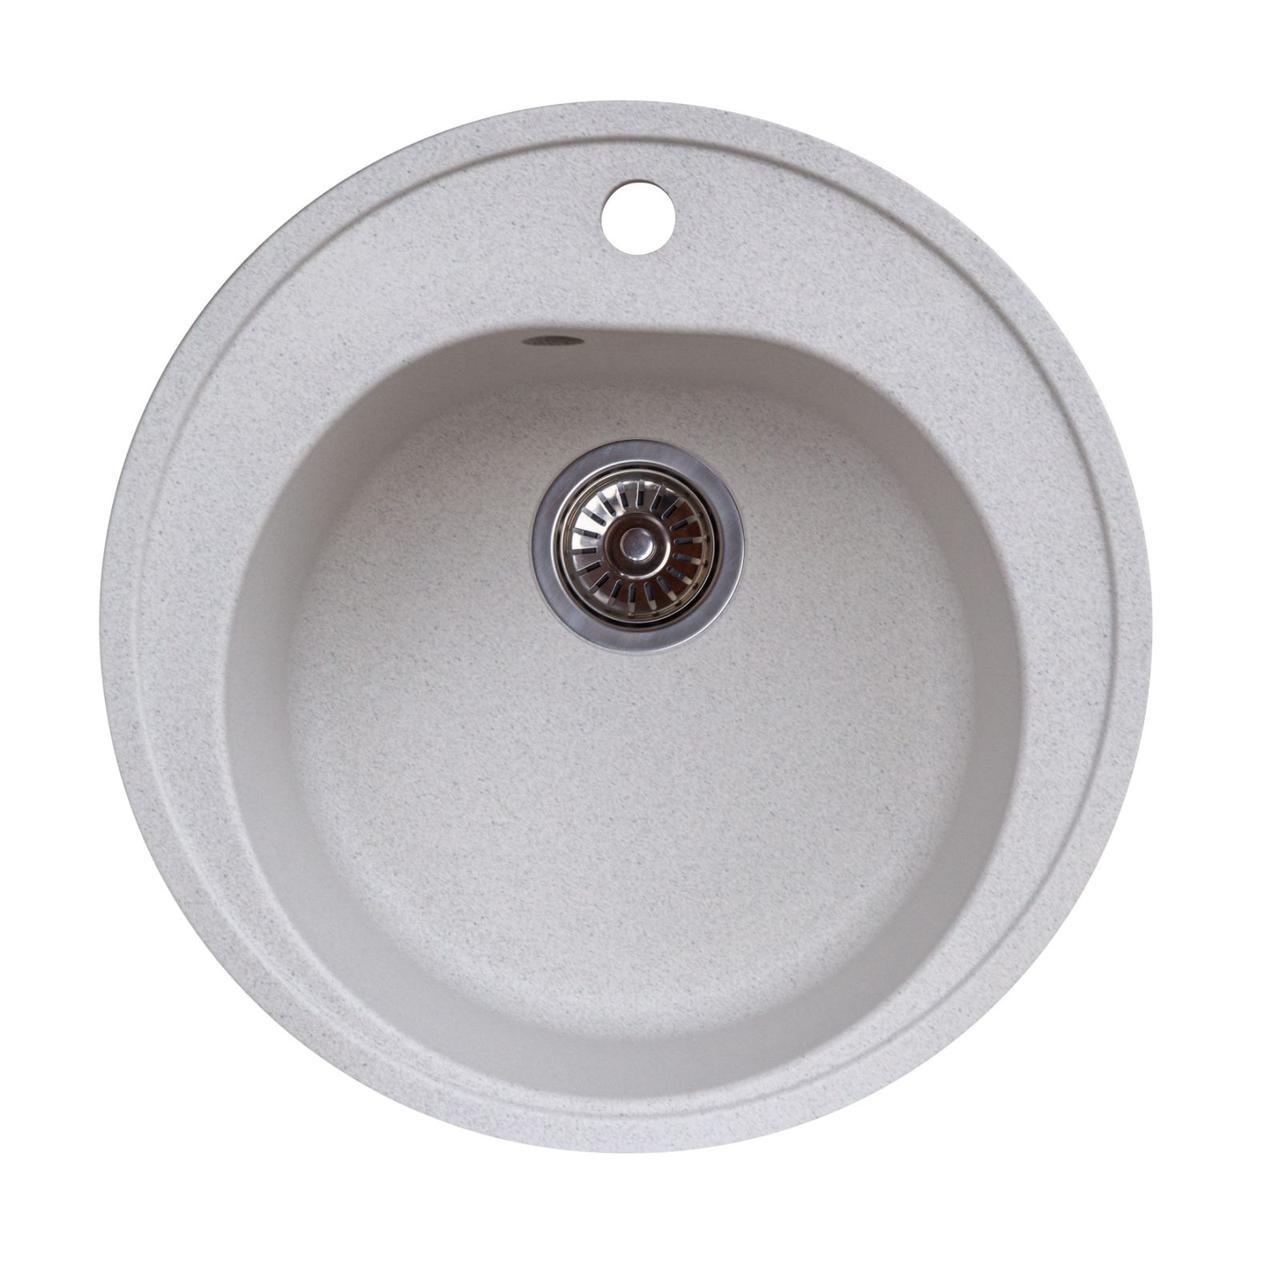 Гранітна мийка для кухні Platinum 510 LUNA матова Топаз